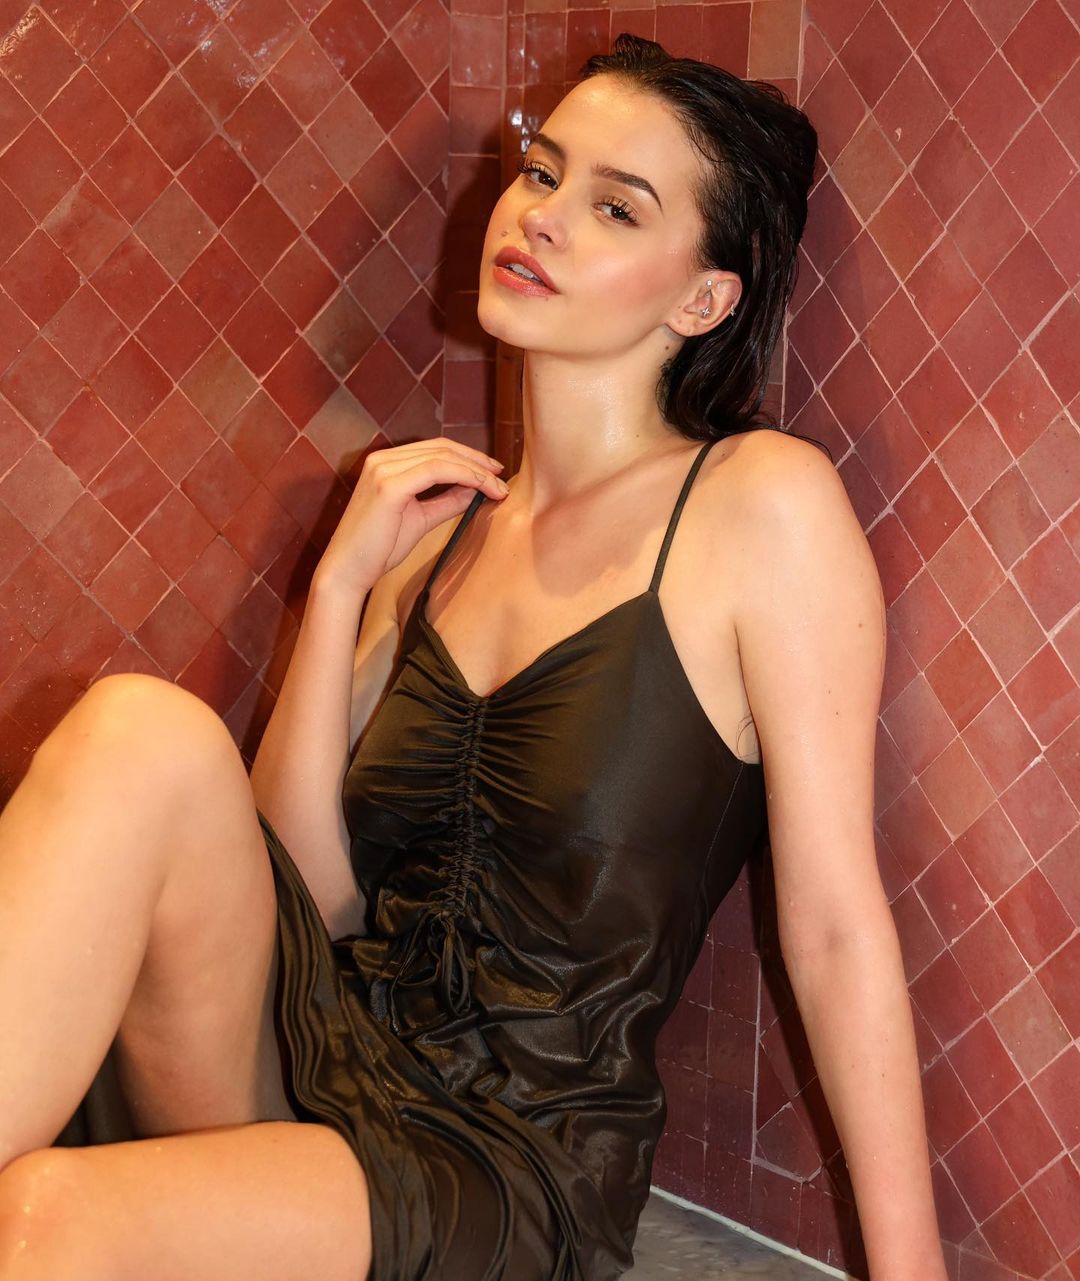 Lea Elui thigh pics